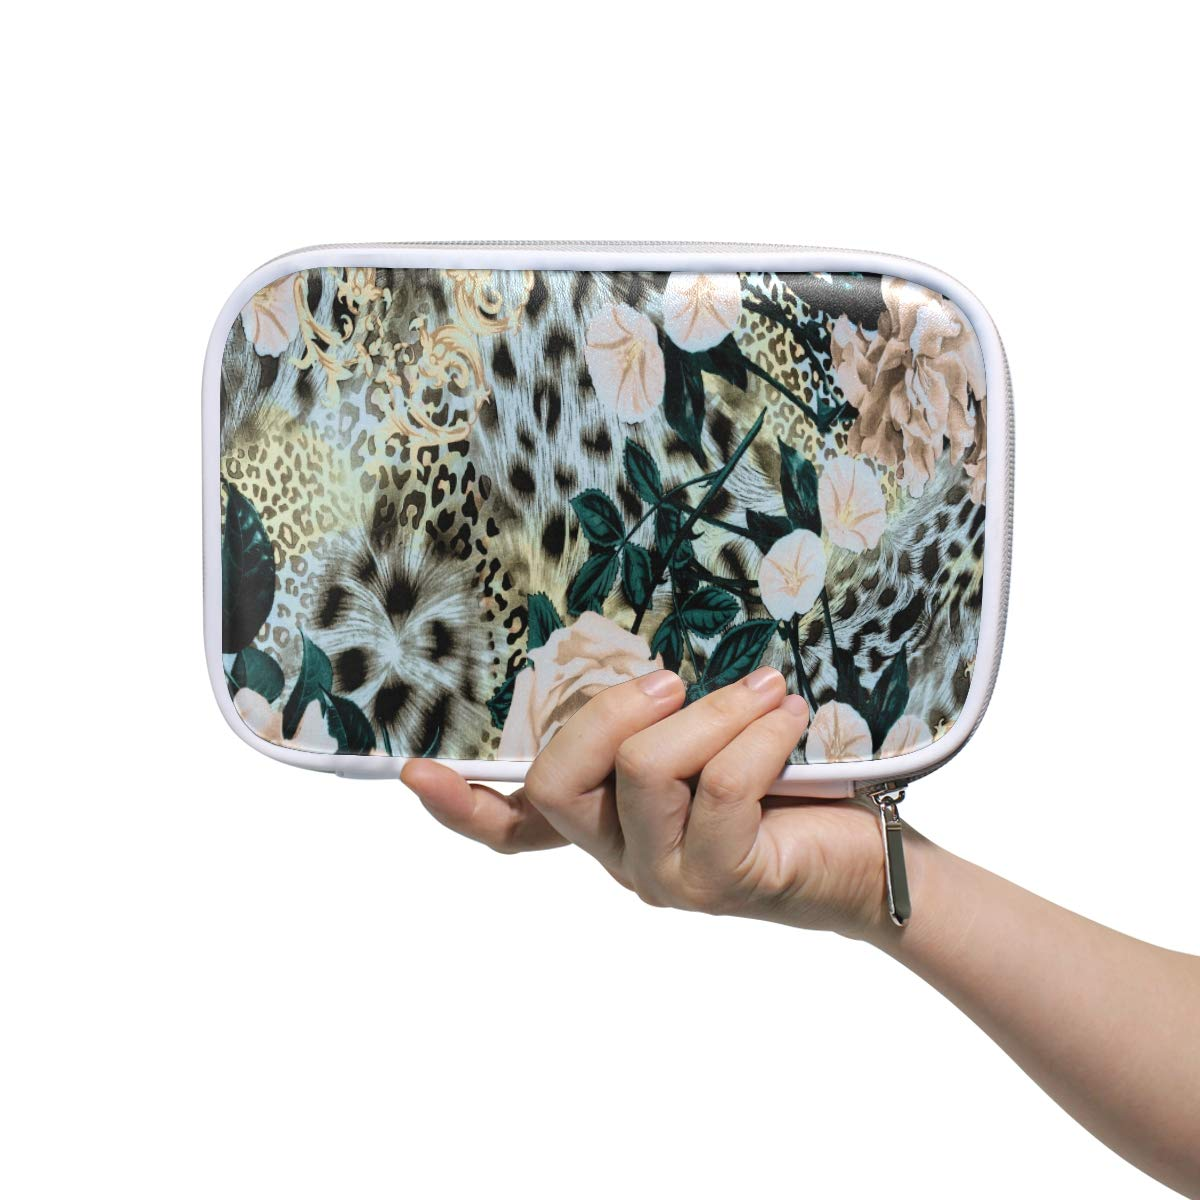 WXLIFE Animal Leopard Print Rose Multi-Functional Zippered Cosmetic Bags Travel Pouch Bag Makeup Passport Holder Storage Pencil Case Pen Bag for Kids Boy Girls School